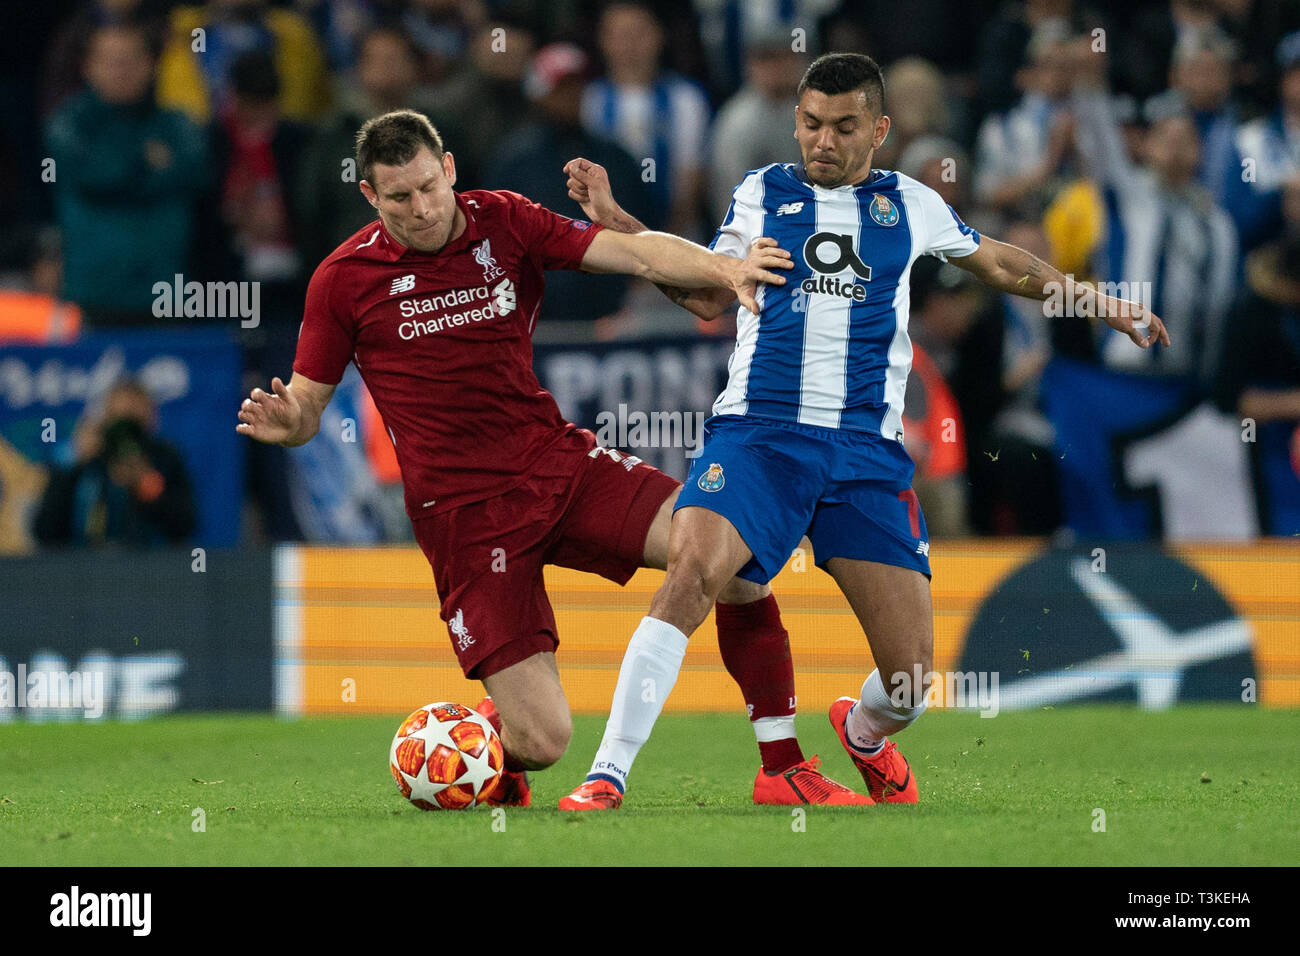 eb74b1944 Liverpool s James Milner battles with Porto s Jesus Corona 9th April 2019